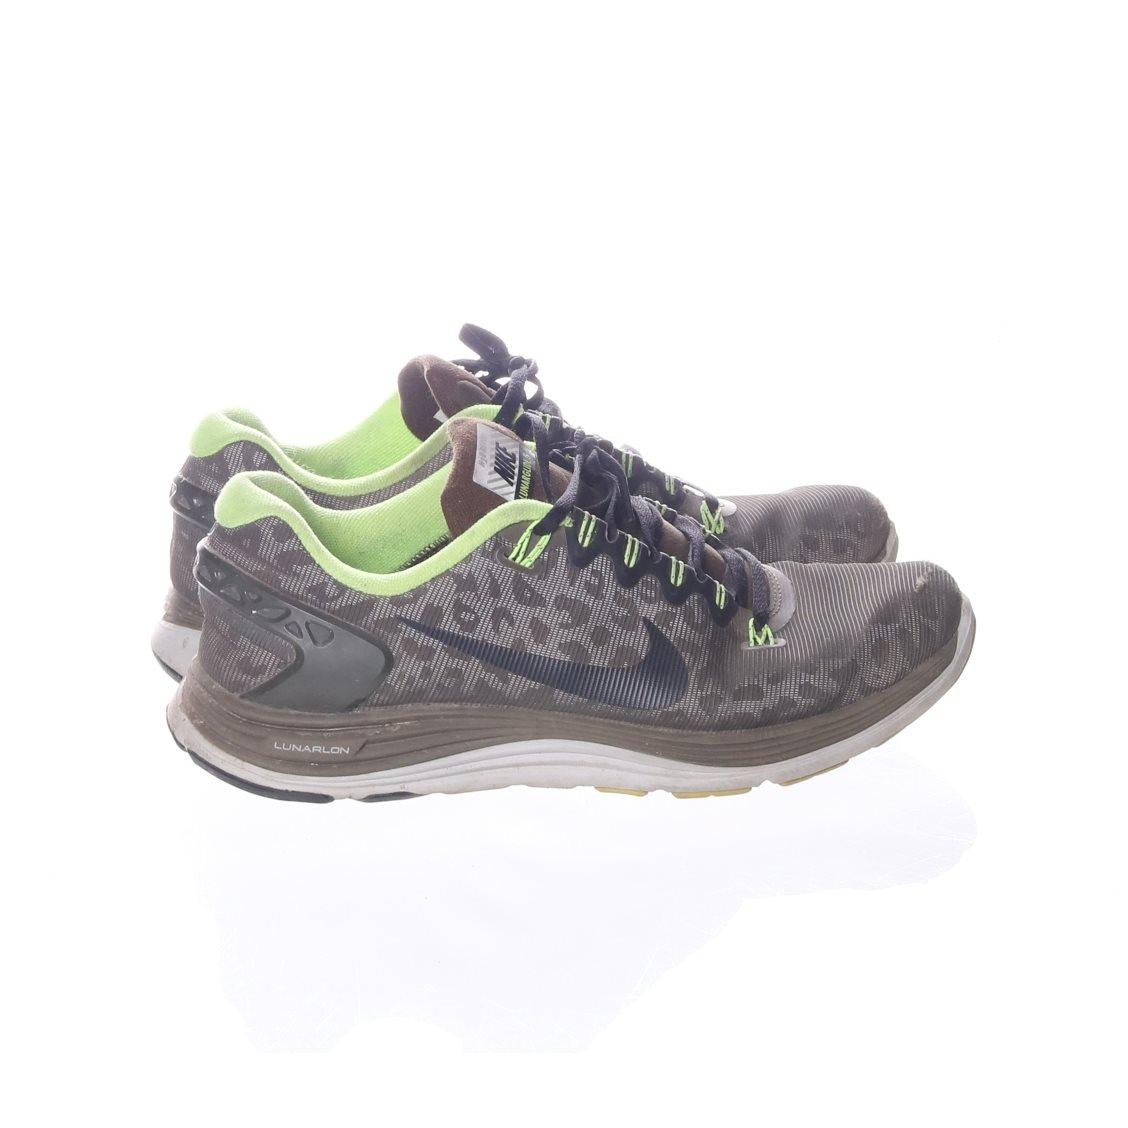 sports shoes 57f92 ce58c Nike, Träningsskor, Strl  42, Lunarglide 5, Brun Limegrön